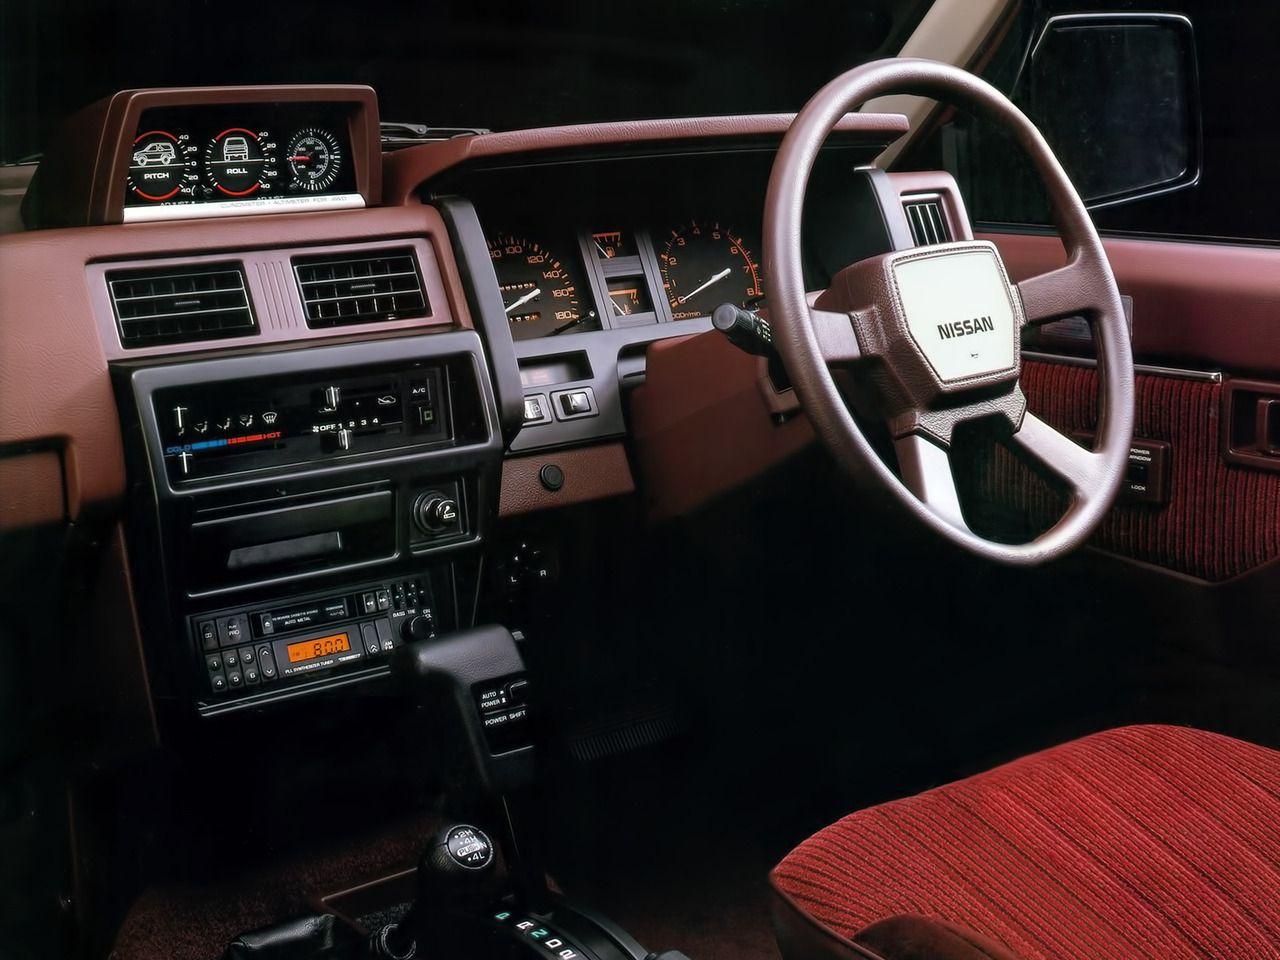 1987 Nissan Terrano Auto Interior Nissan Terrano